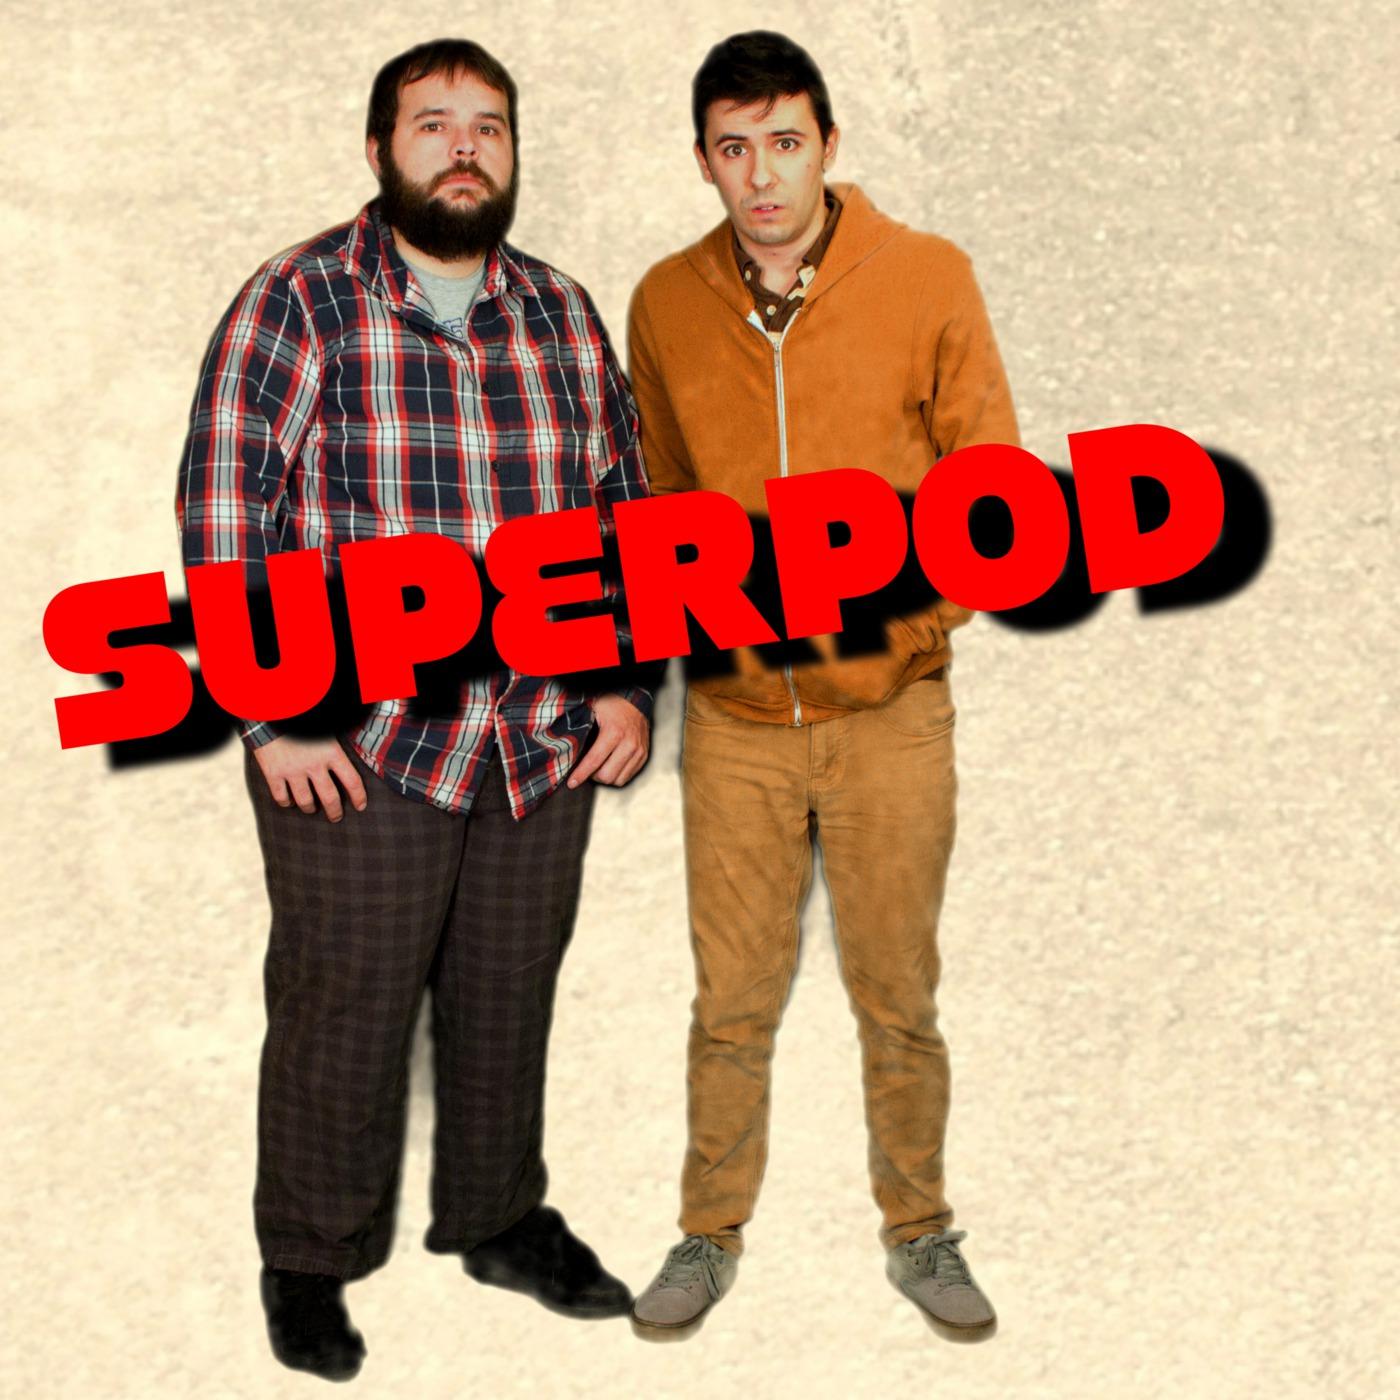 SUPERPOD